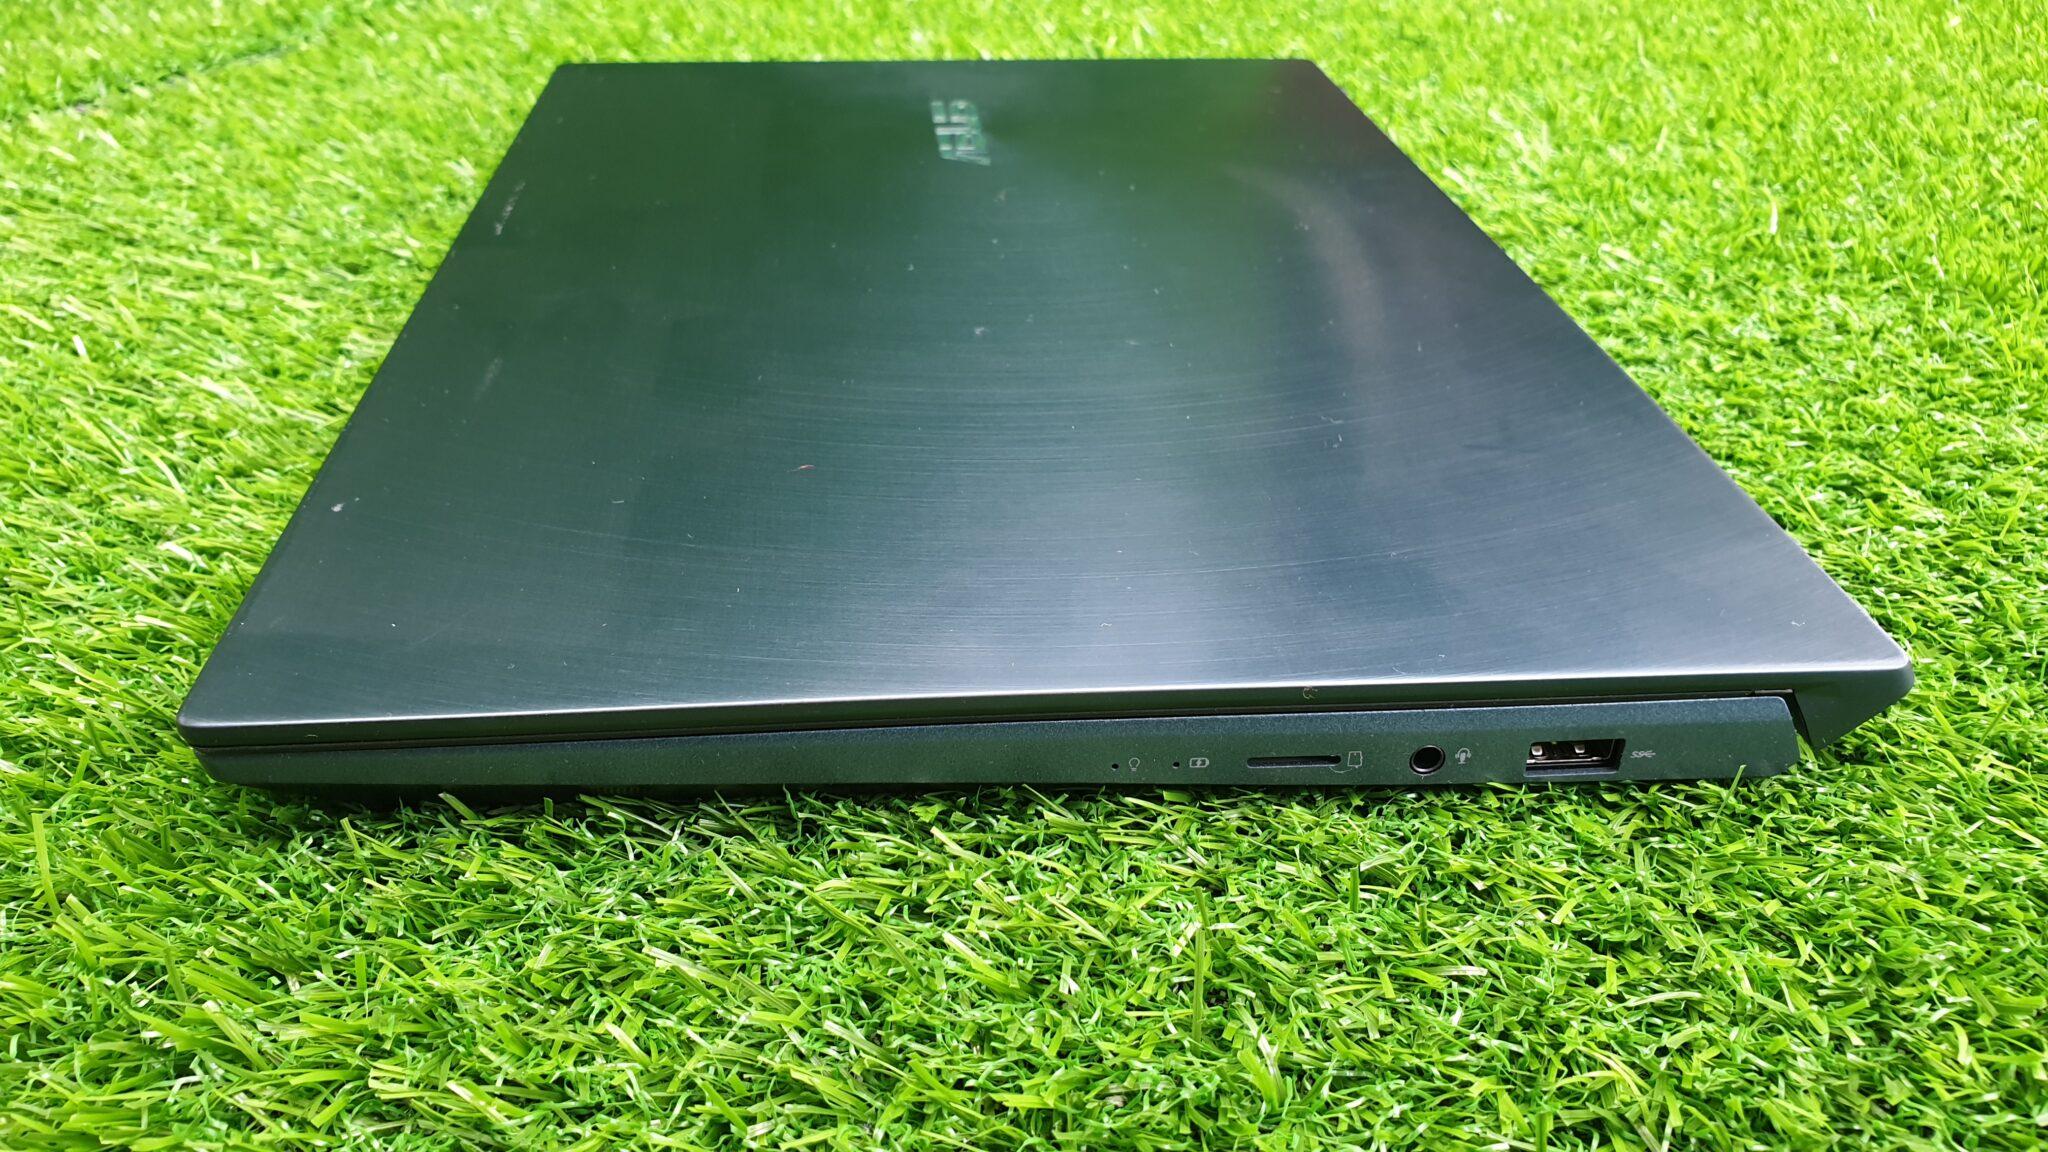 ZenBook Duo UX481F side angle